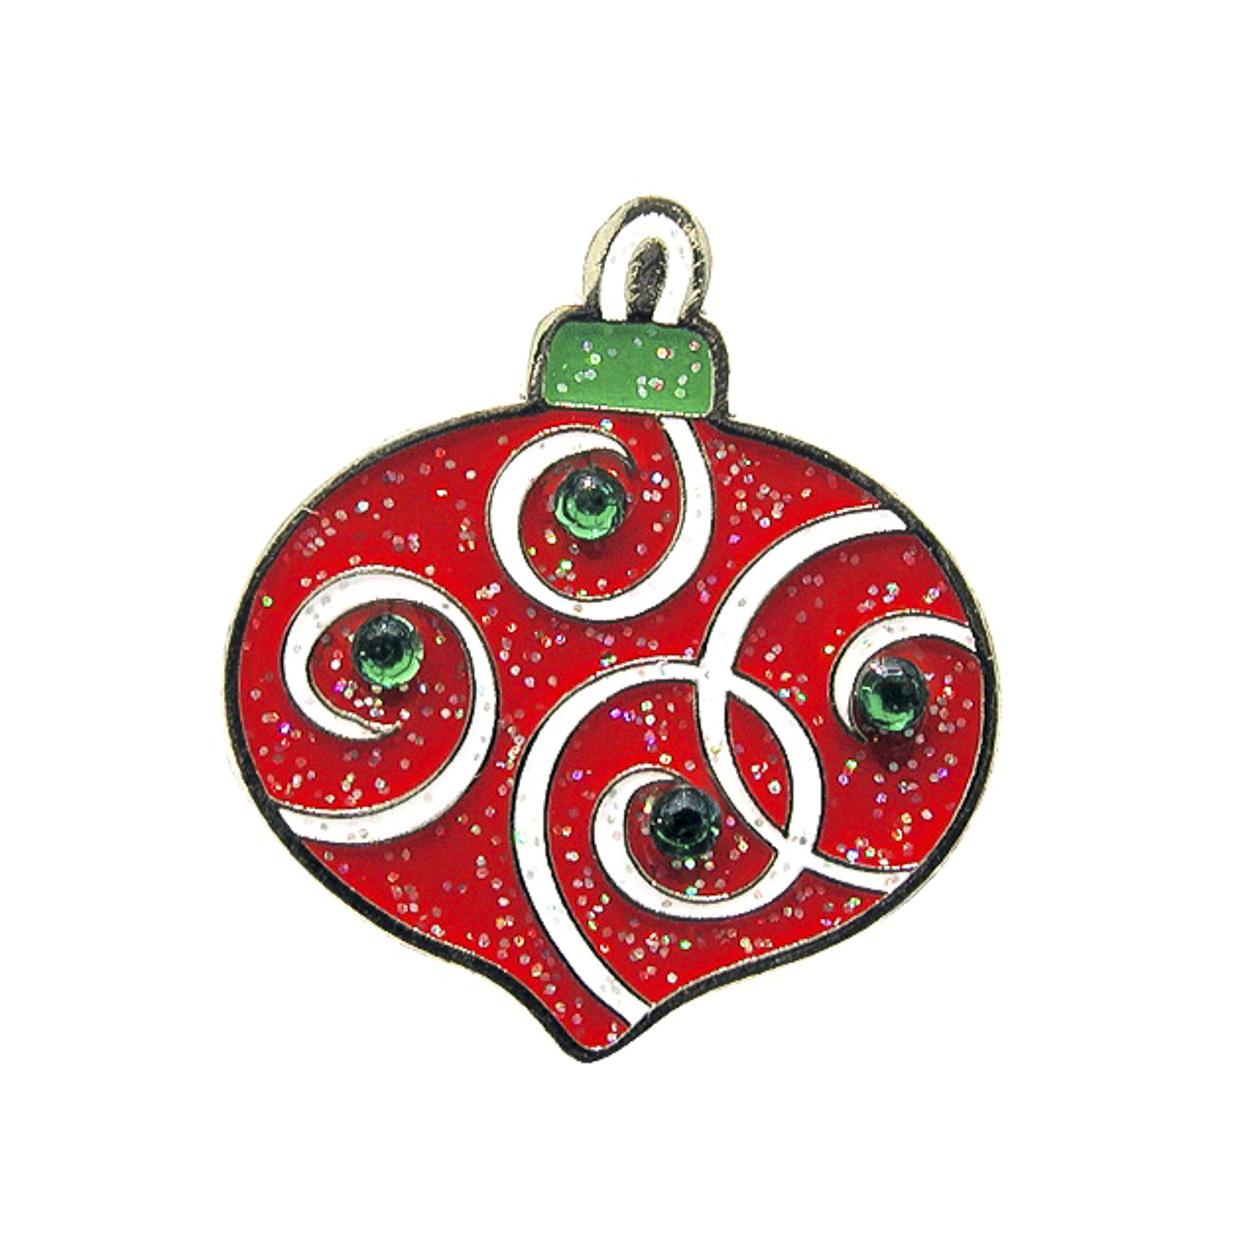 221. Ornament